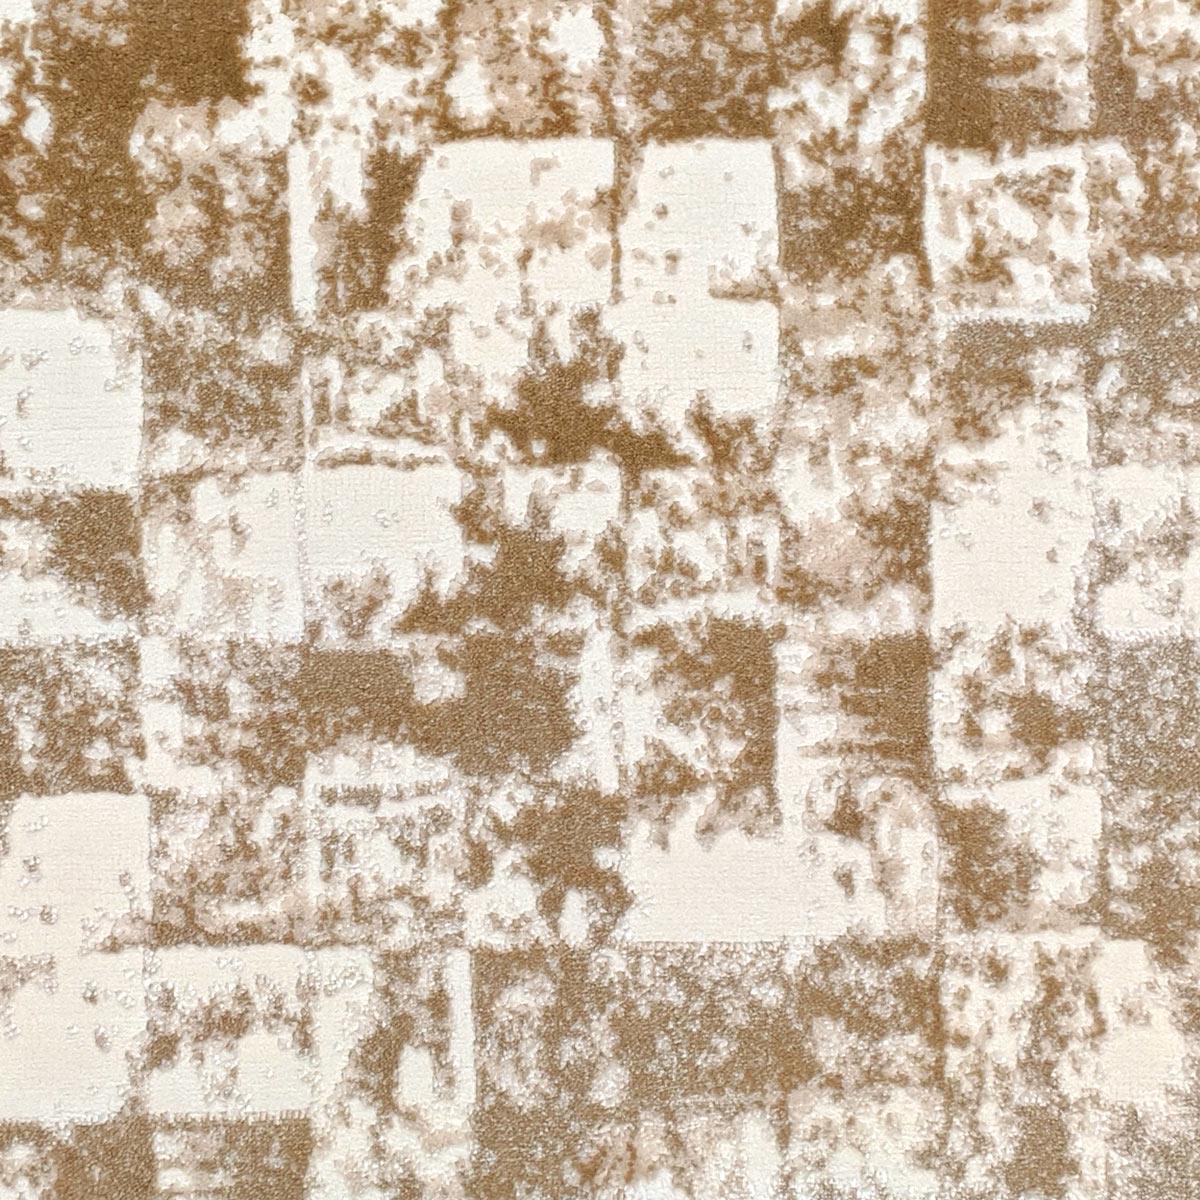 hotshot_polypropylene-polyester_broadloom_patterson-flynn-martin_pfm